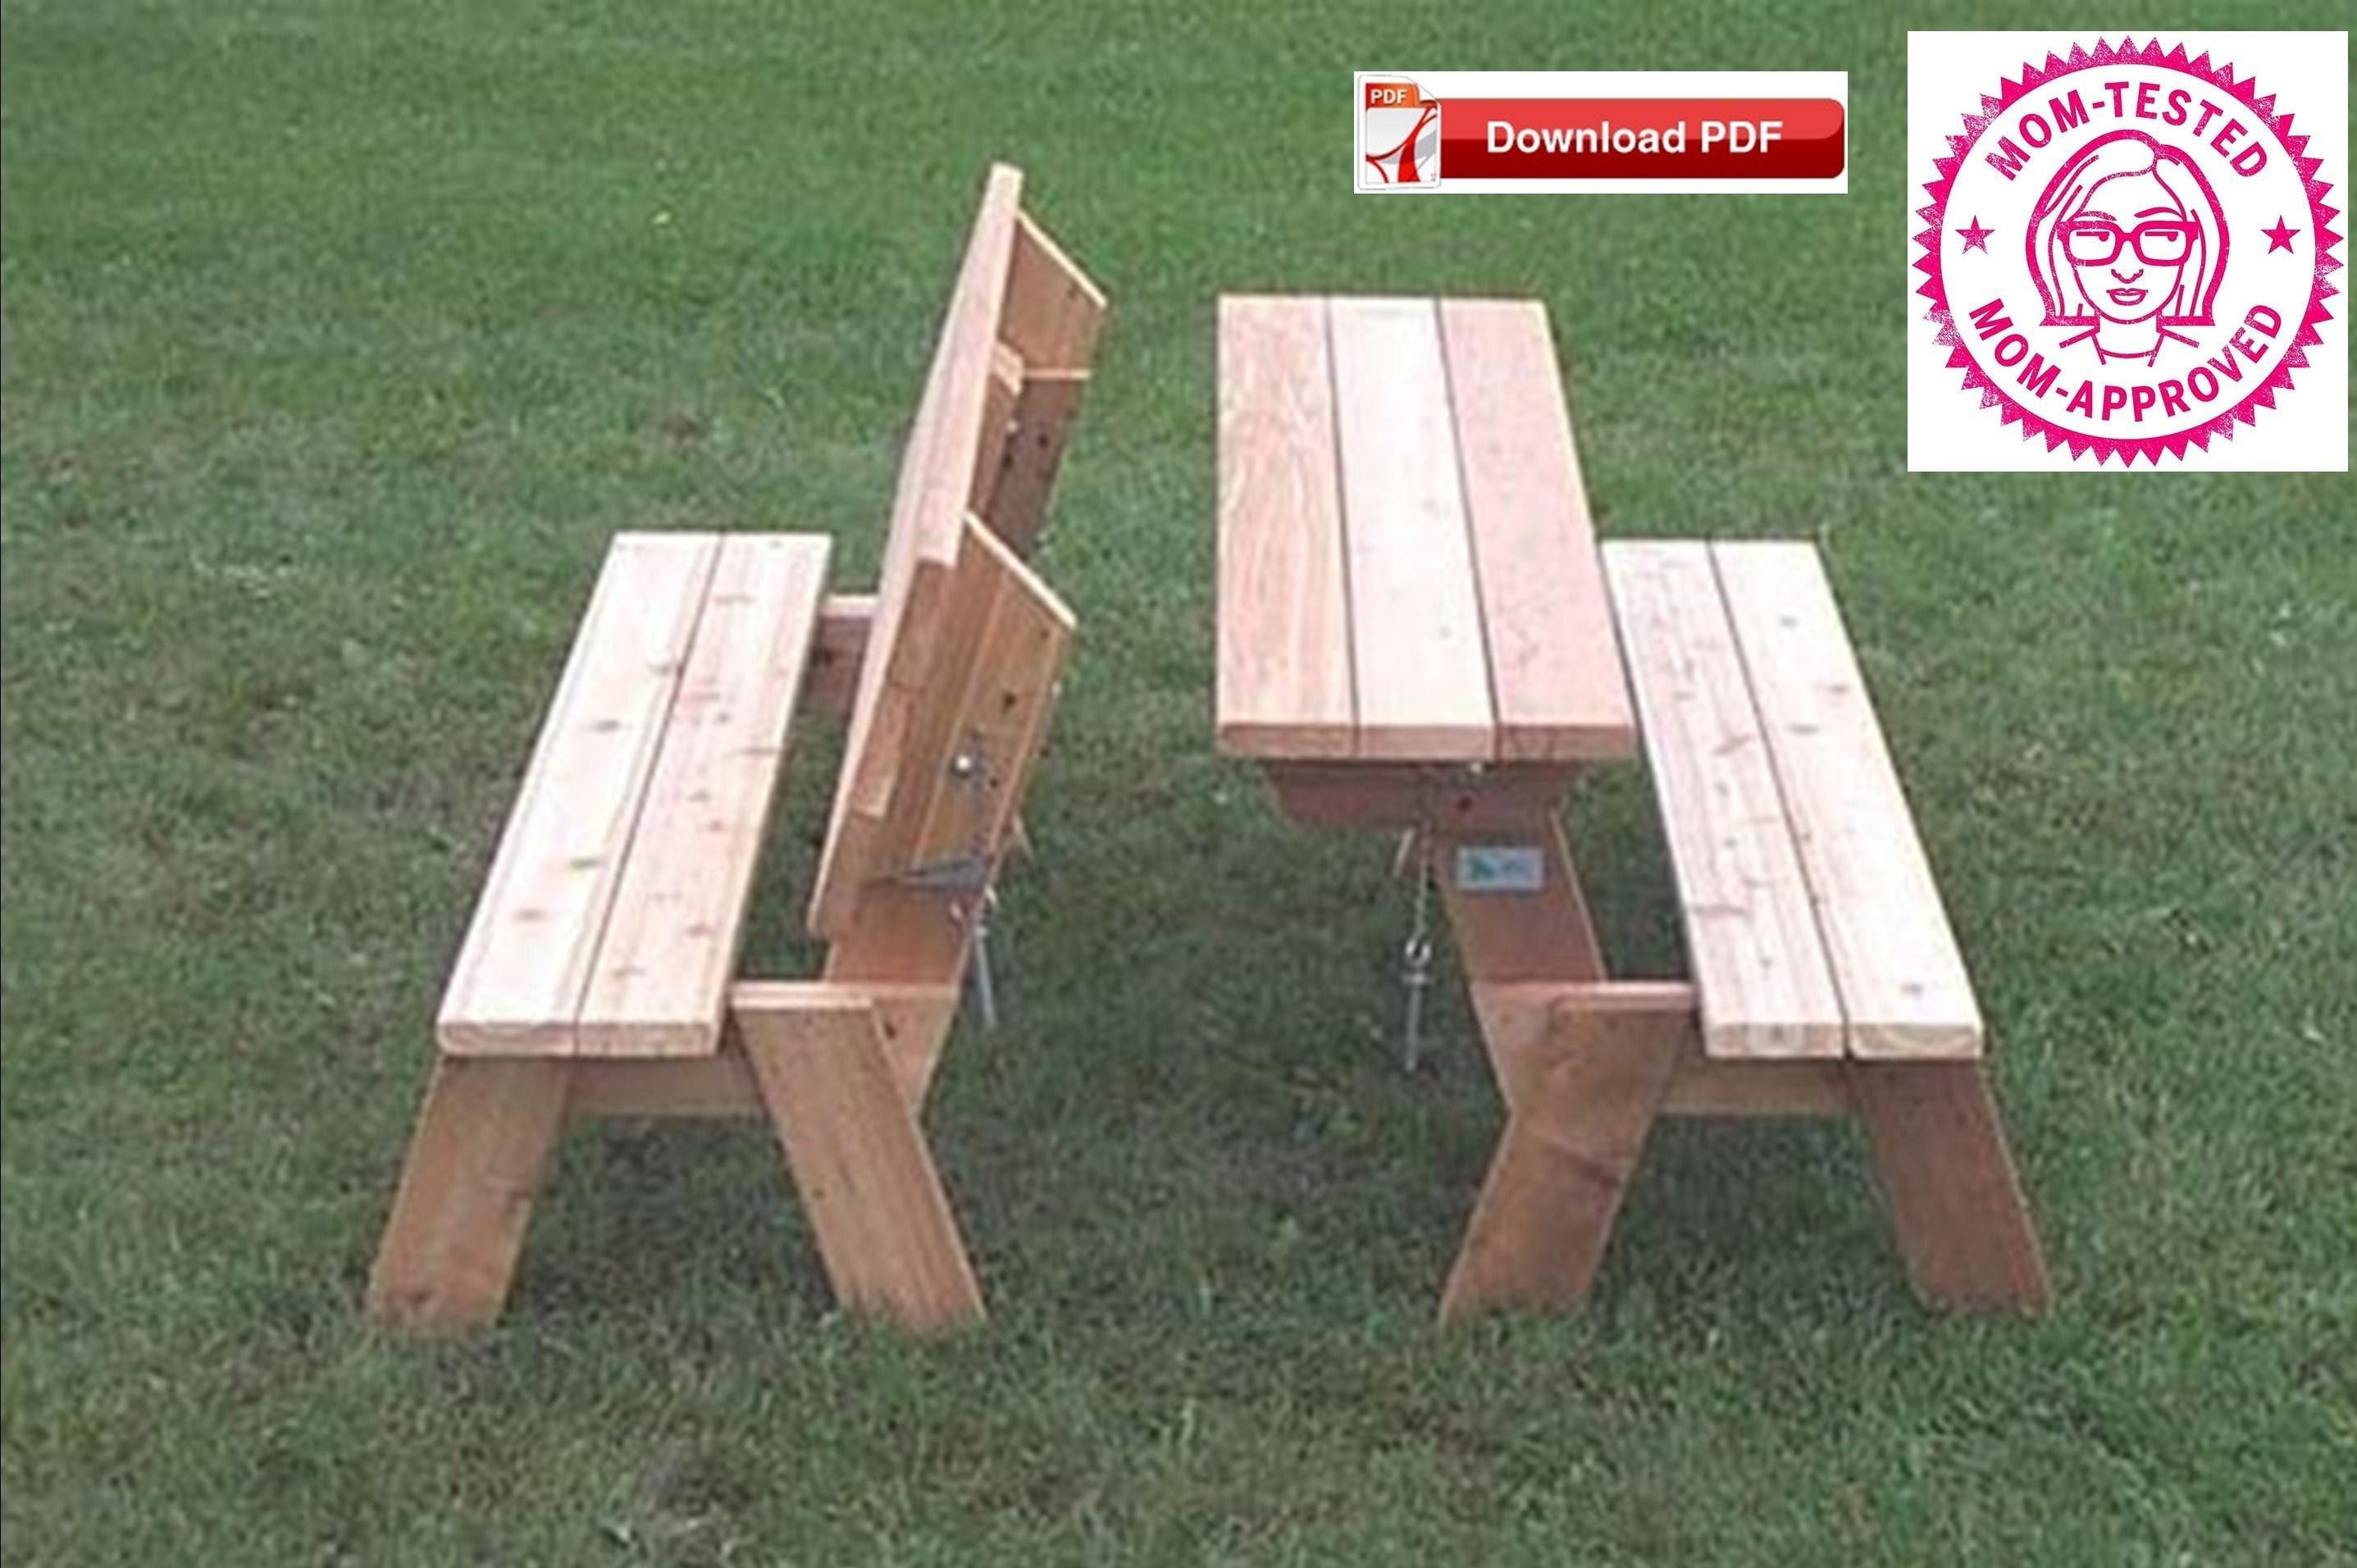 Charmant Folding Picnic Table Plan/Folding Bench Plan/Combo Picnic Table Bench  Plan/Porch Bench Plan/Picnic Table Table Plan/PDF Plan/Wood Pattern